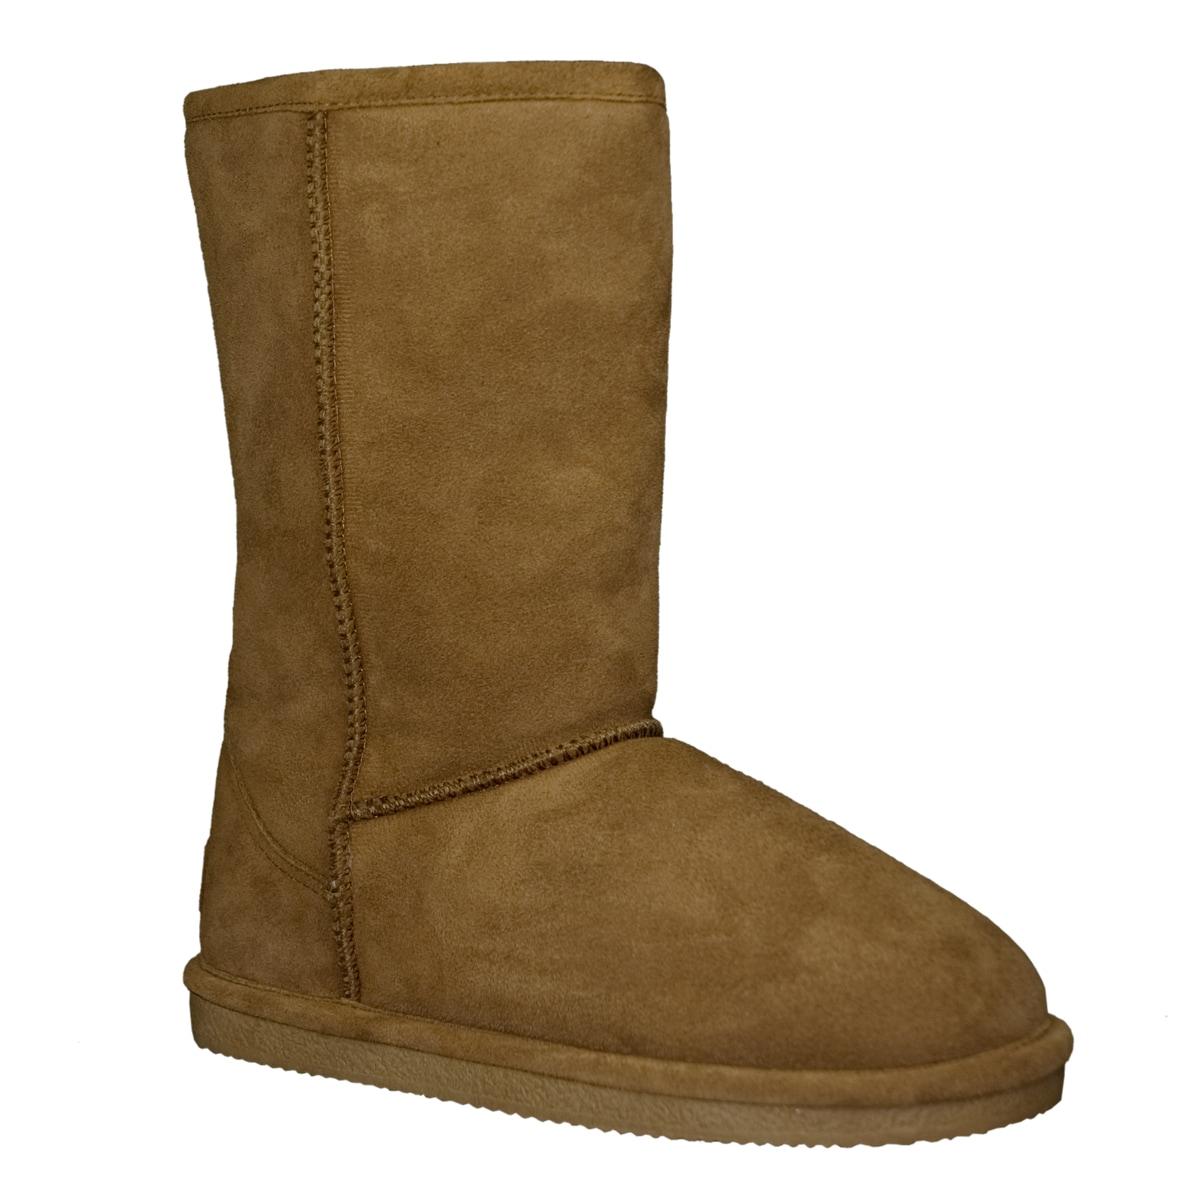 Lugz Women's 'Zen HI' Suede Boots